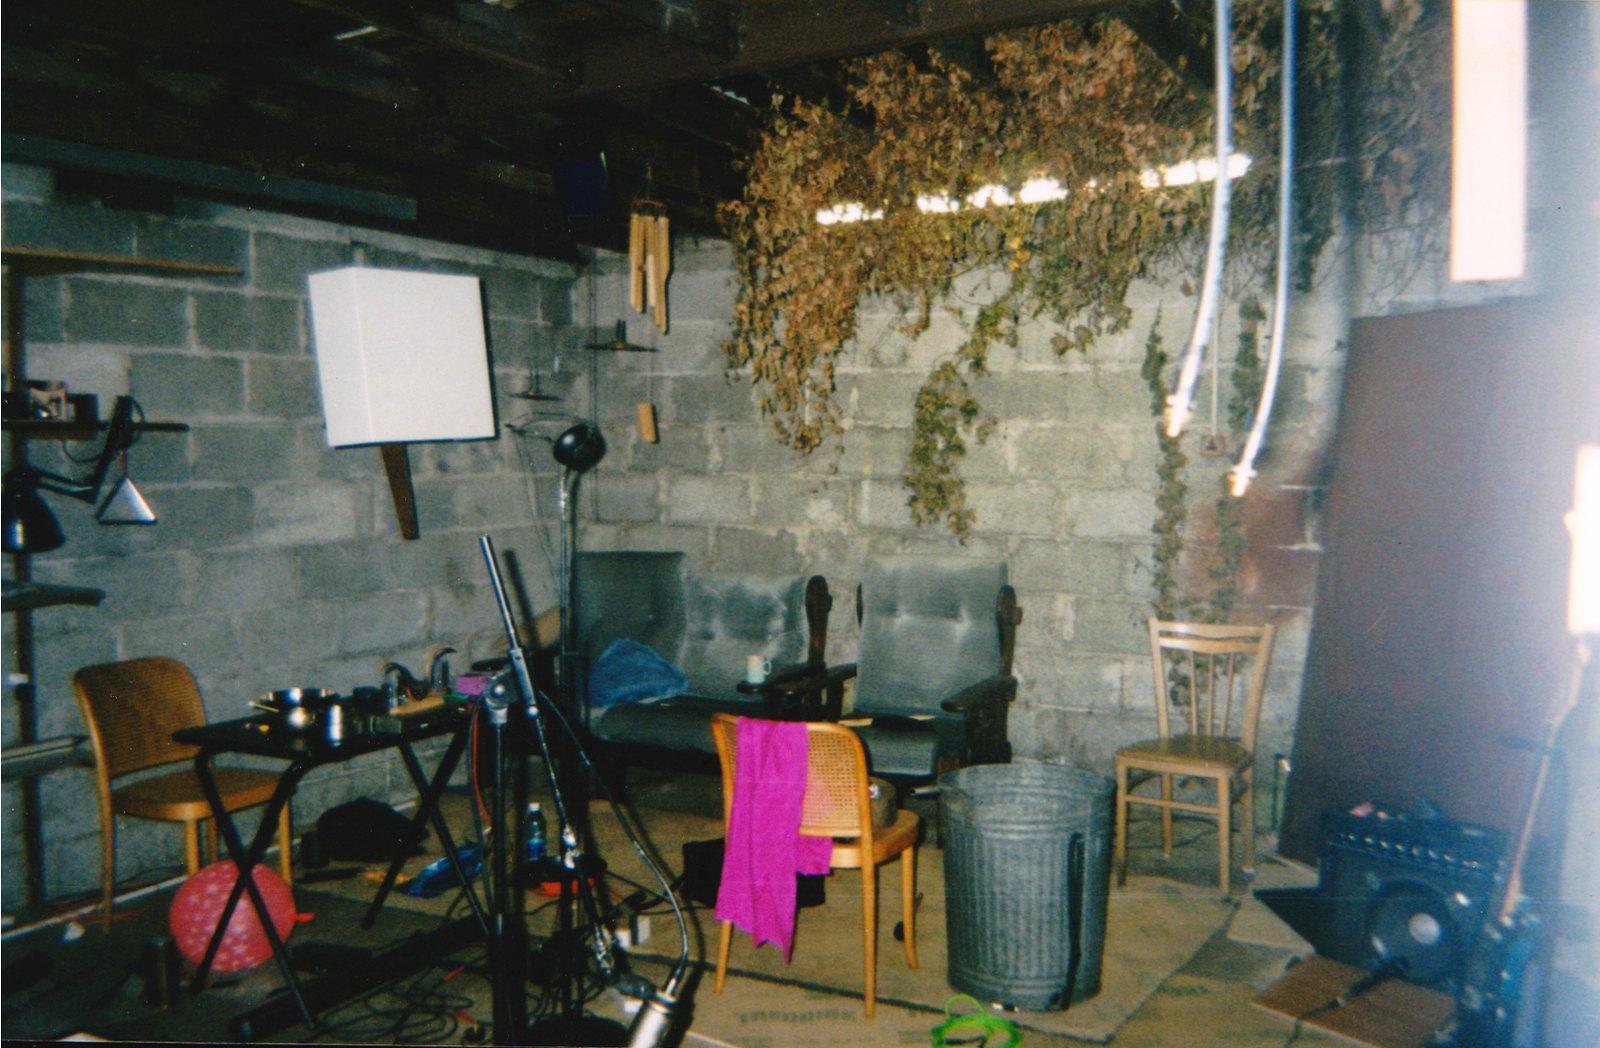 Amygdala Recording Session 2003